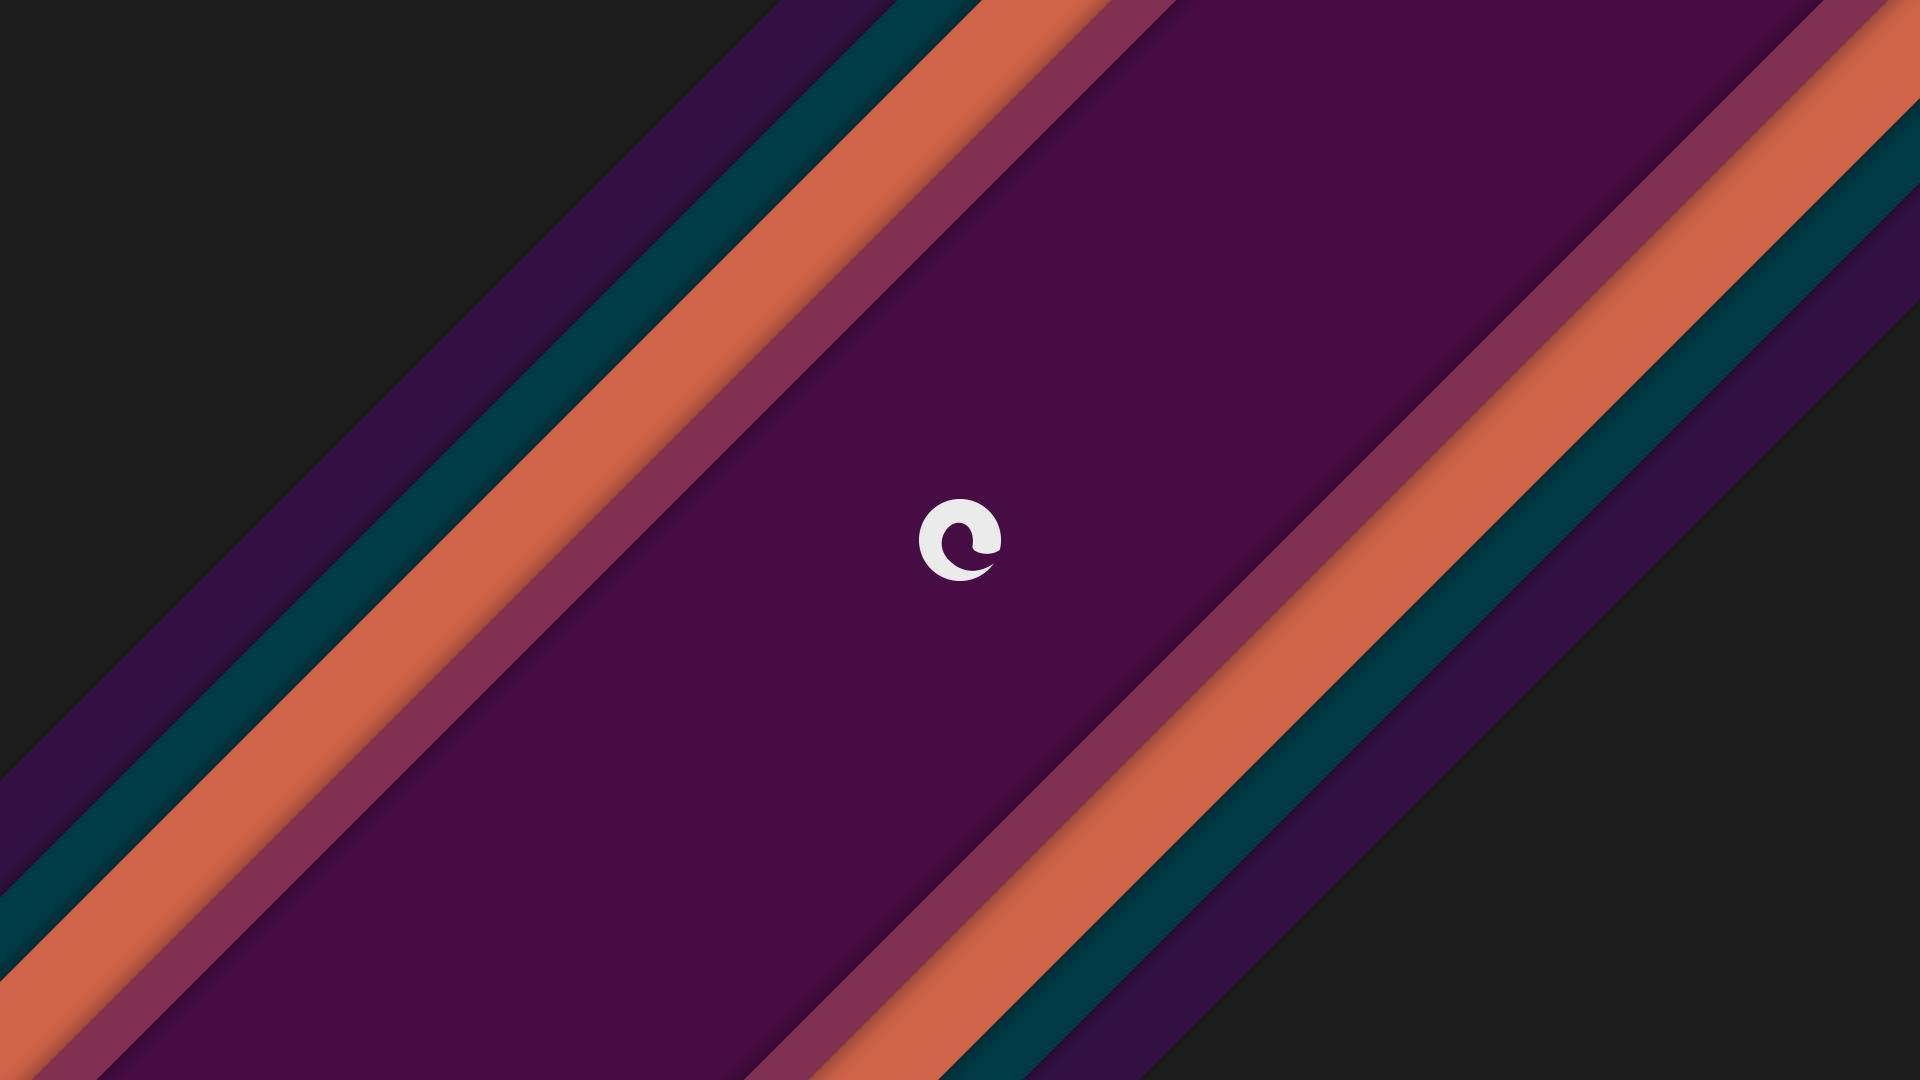 Wallpaper : colorful, neon, minimalism, purple, logo, blue, triangle